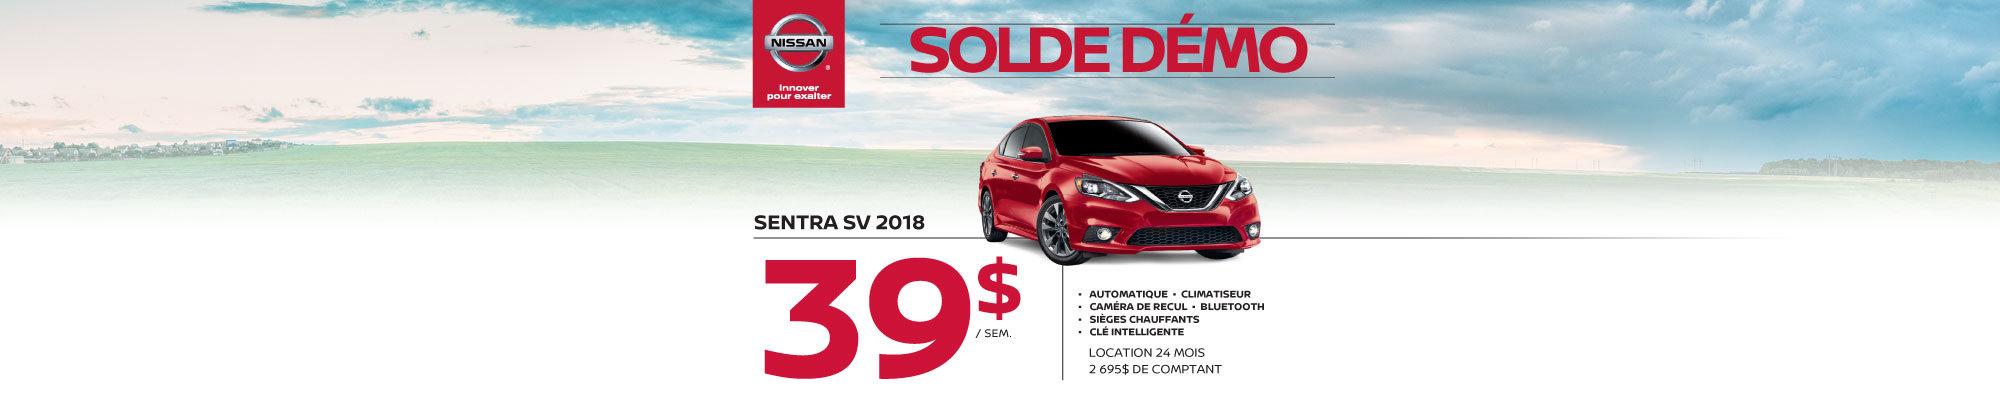 Nissan Sentra 2018 démos web